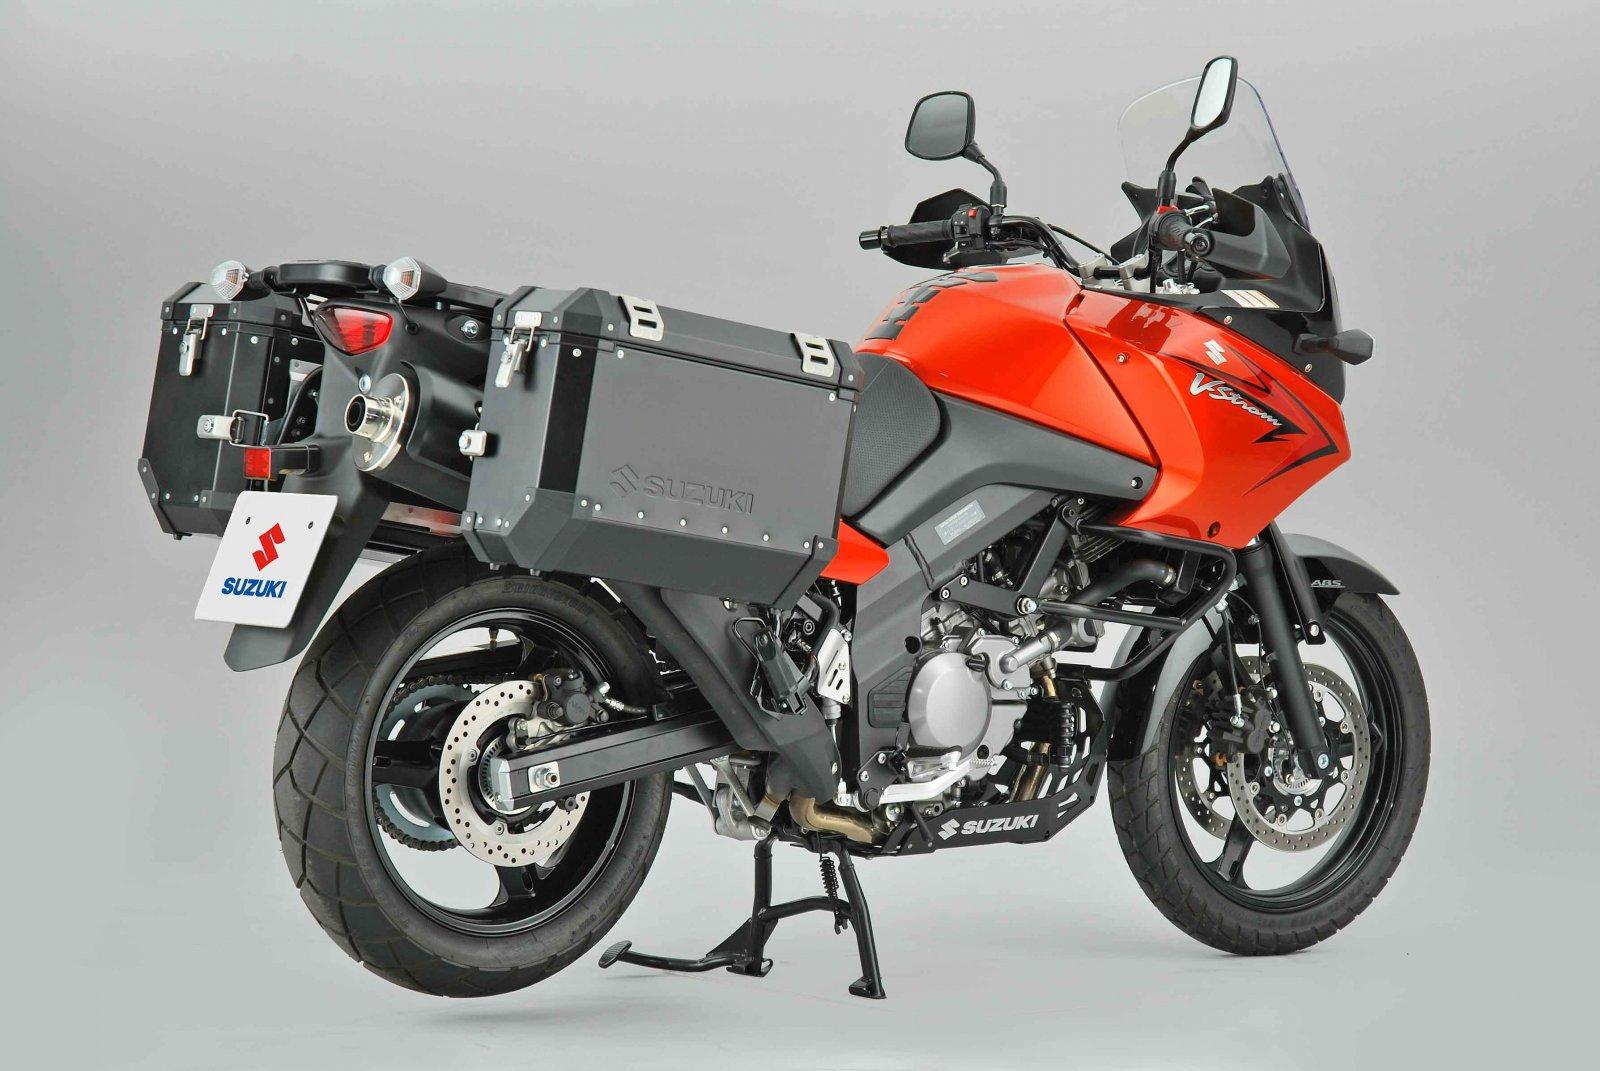 http://2.bp.blogspot.com/_ooiqCxFab5Y/TG5o9Q5AJzI/AAAAAAAAAyE/7DR6QFN6rJ4/s1600/Suzuki+V-Strom+650A+XP+Rear+Side.jpg